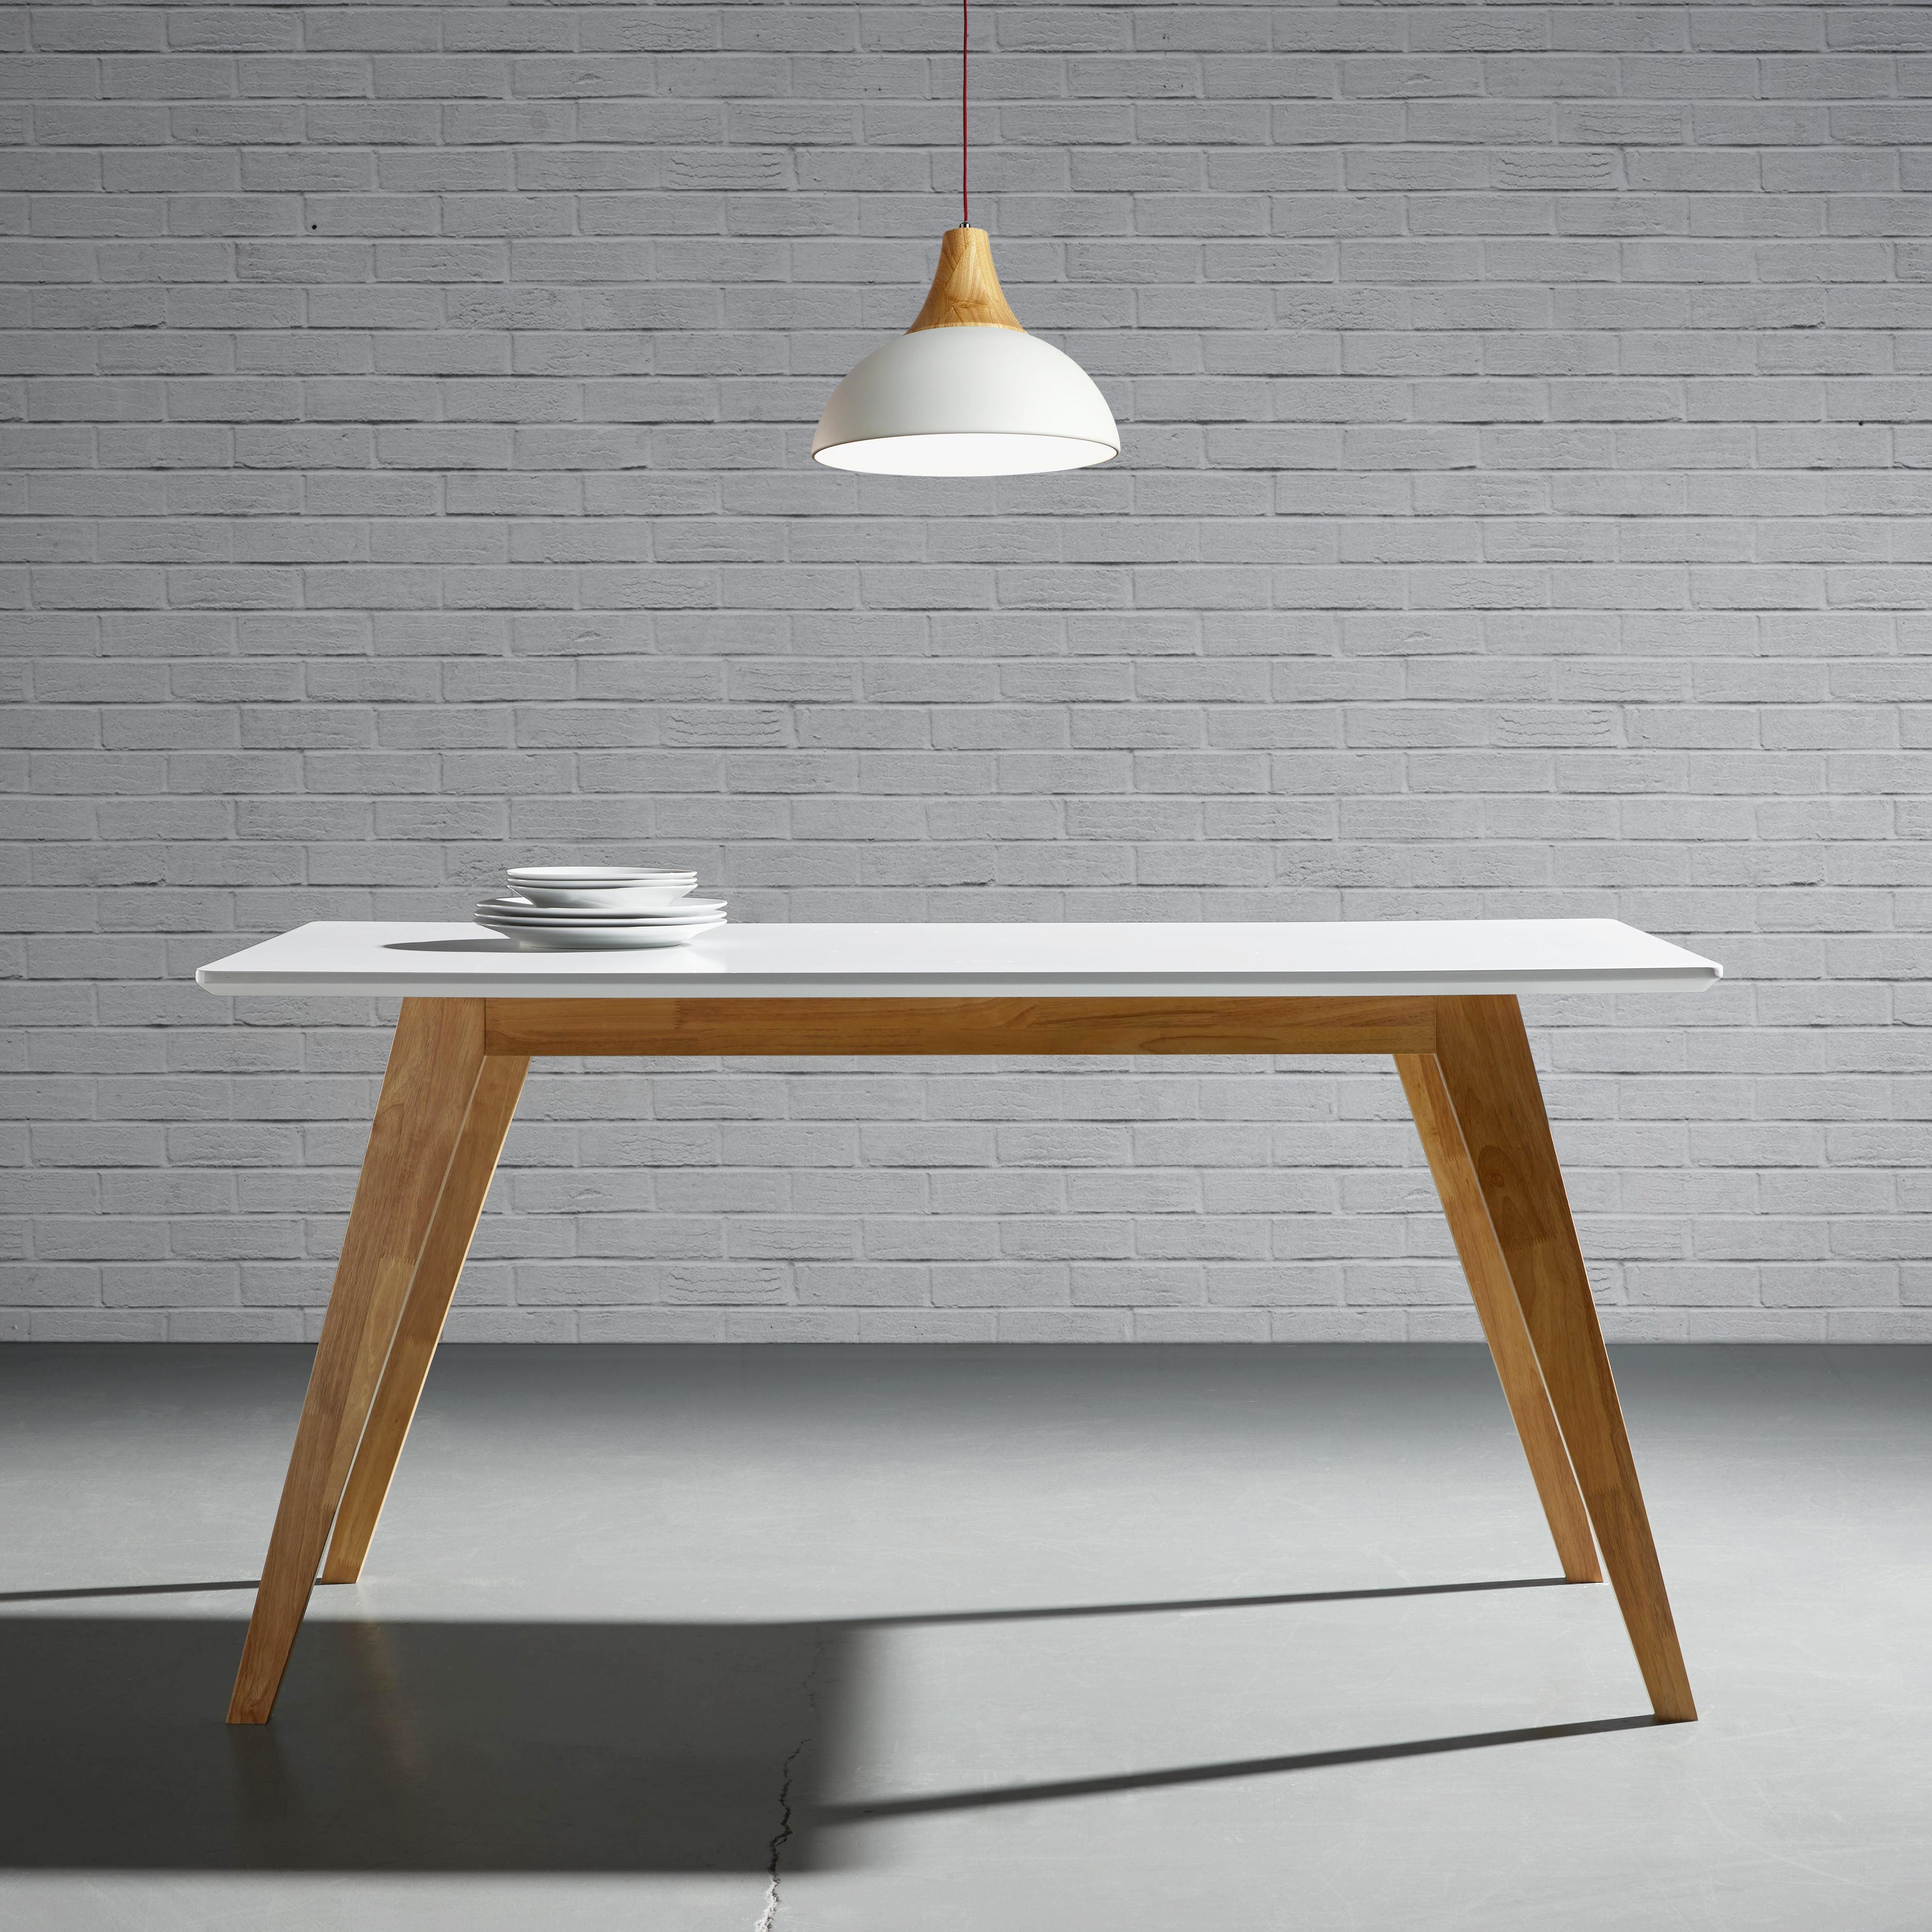 Esstisch holz grau weiss esstisch harry xcm modern holz for Eames nachbildung